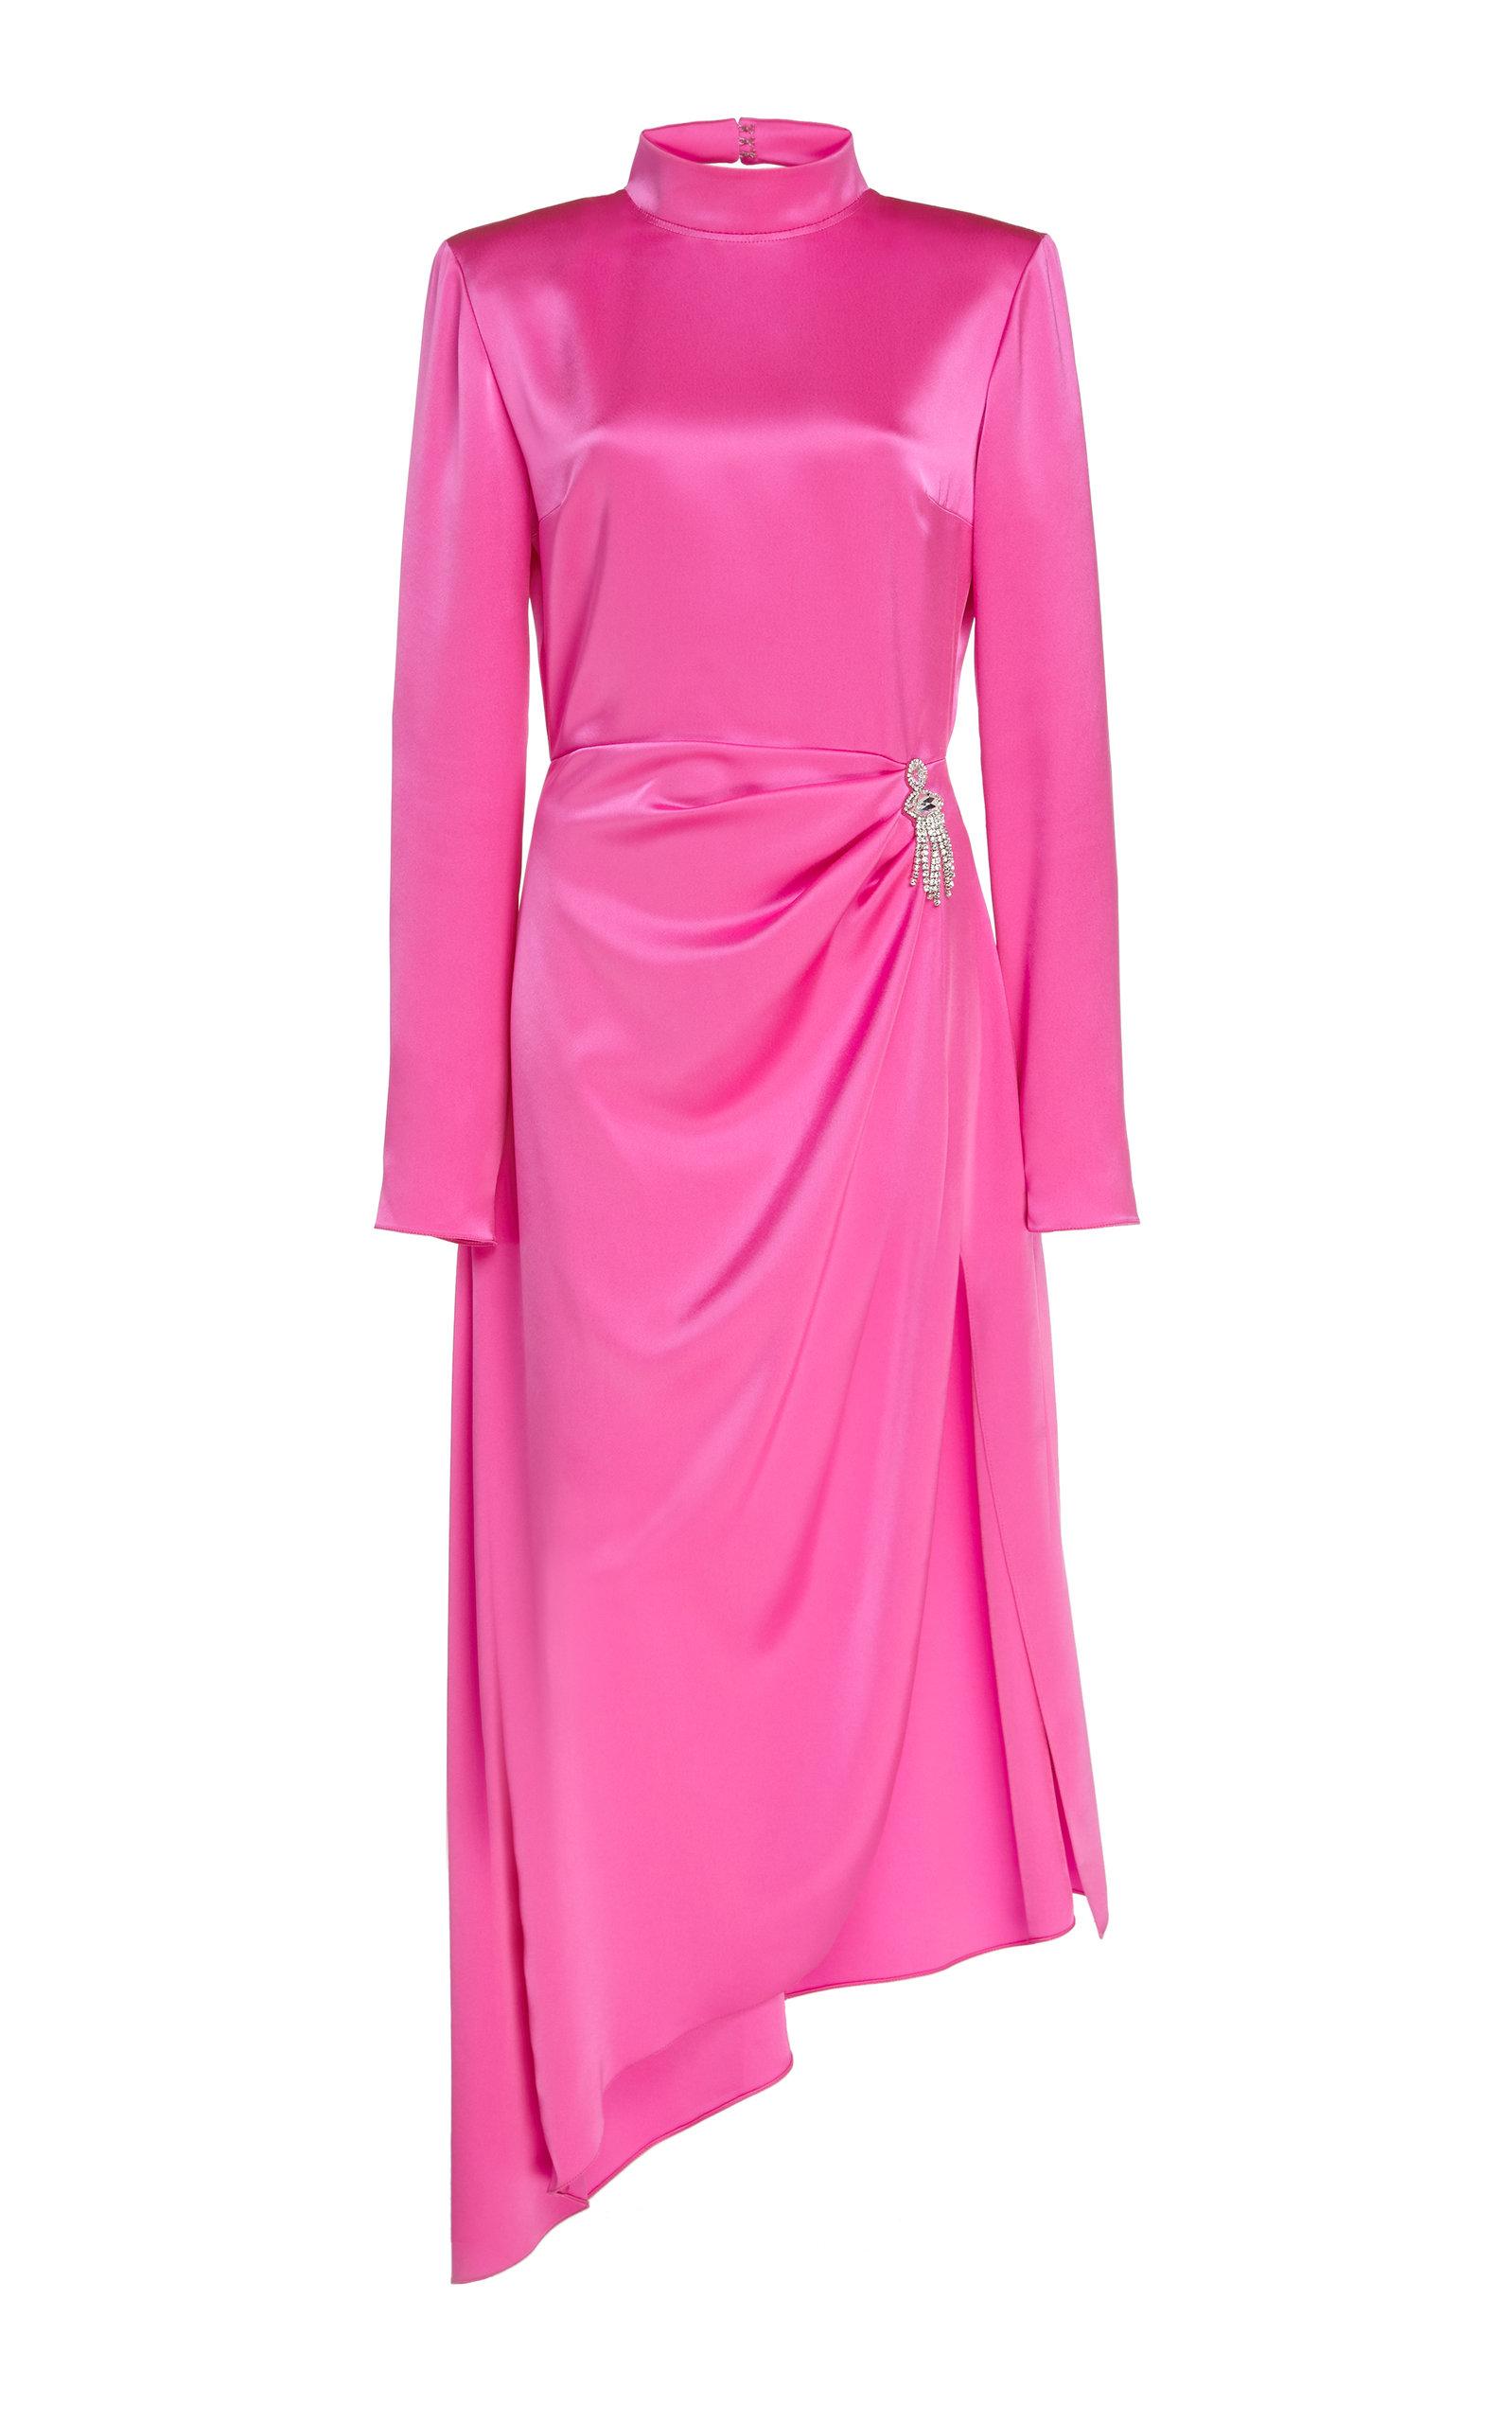 Buy David Koma Crystal Brooch Open-Back Satin Dress online, shop David Koma at the best price